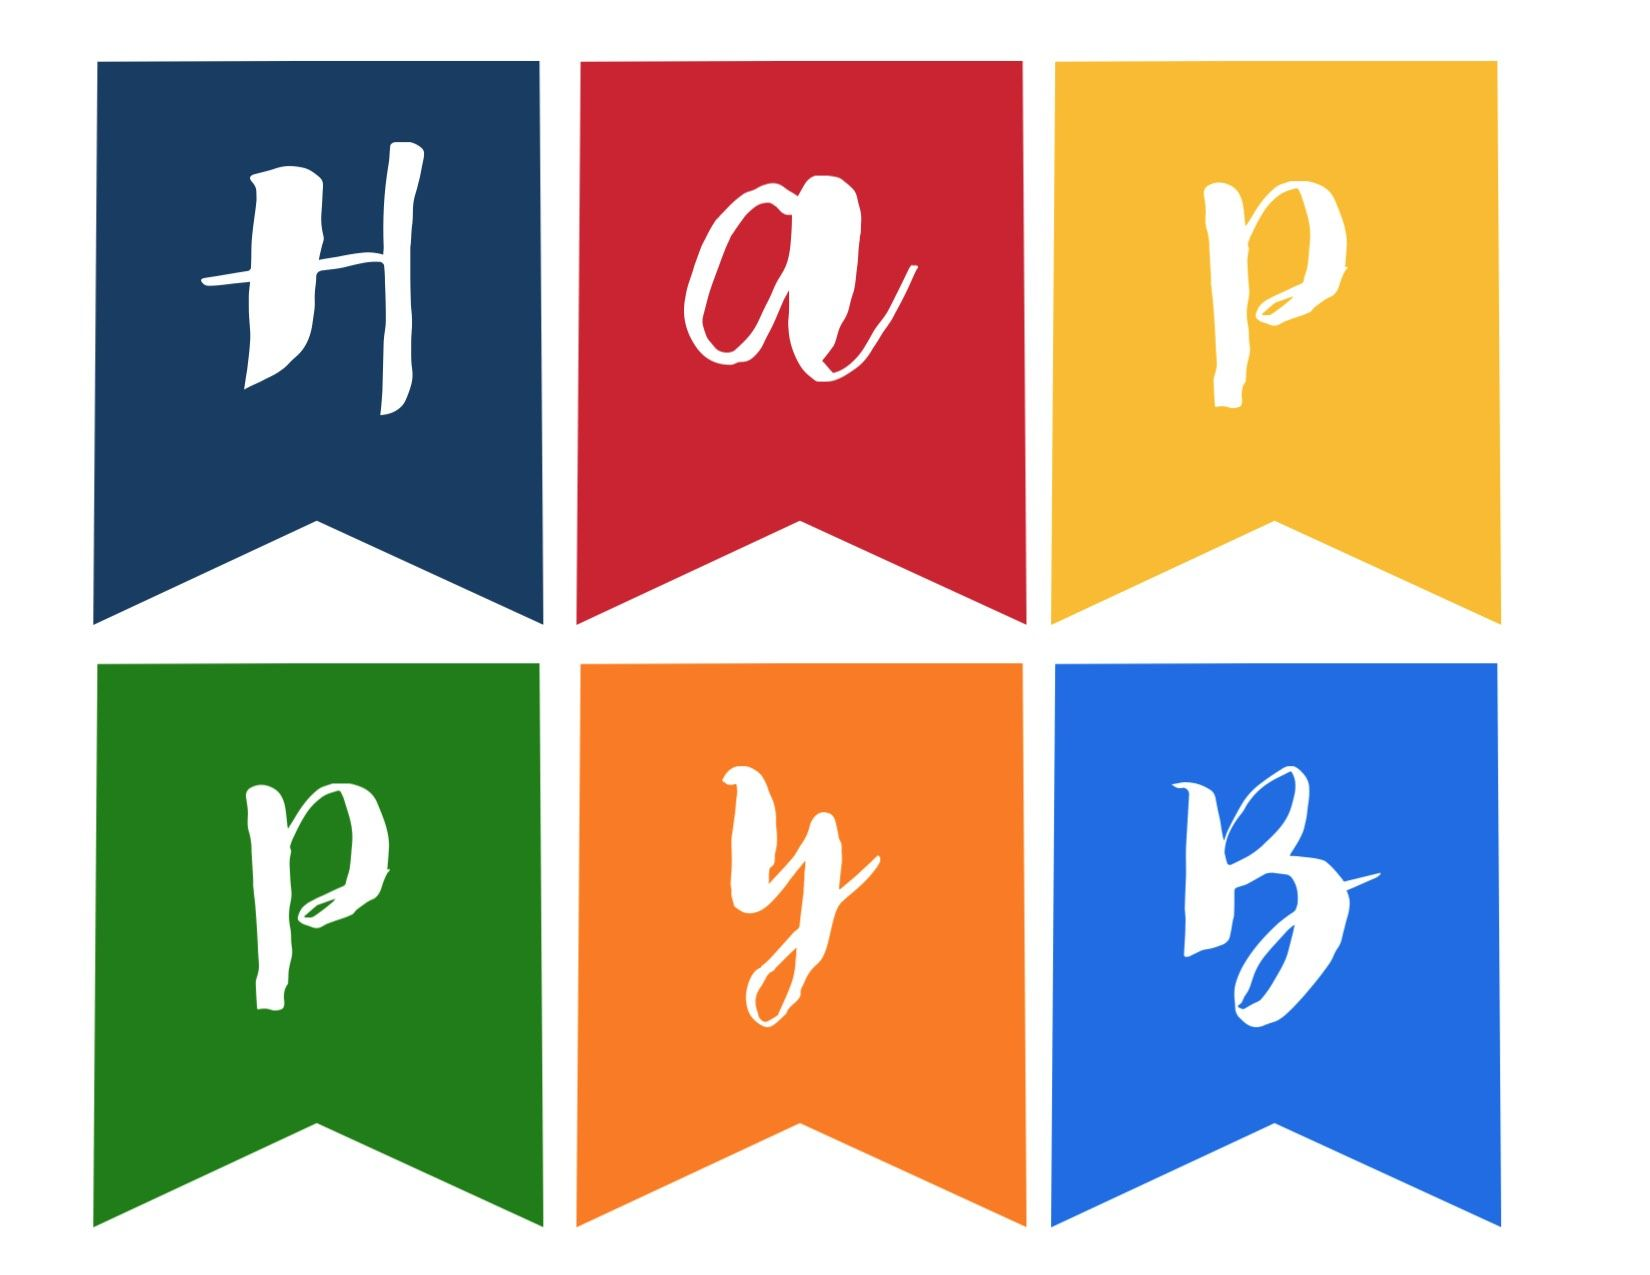 Pin by Martha kihlgren on Party | Happy birthday banner ...